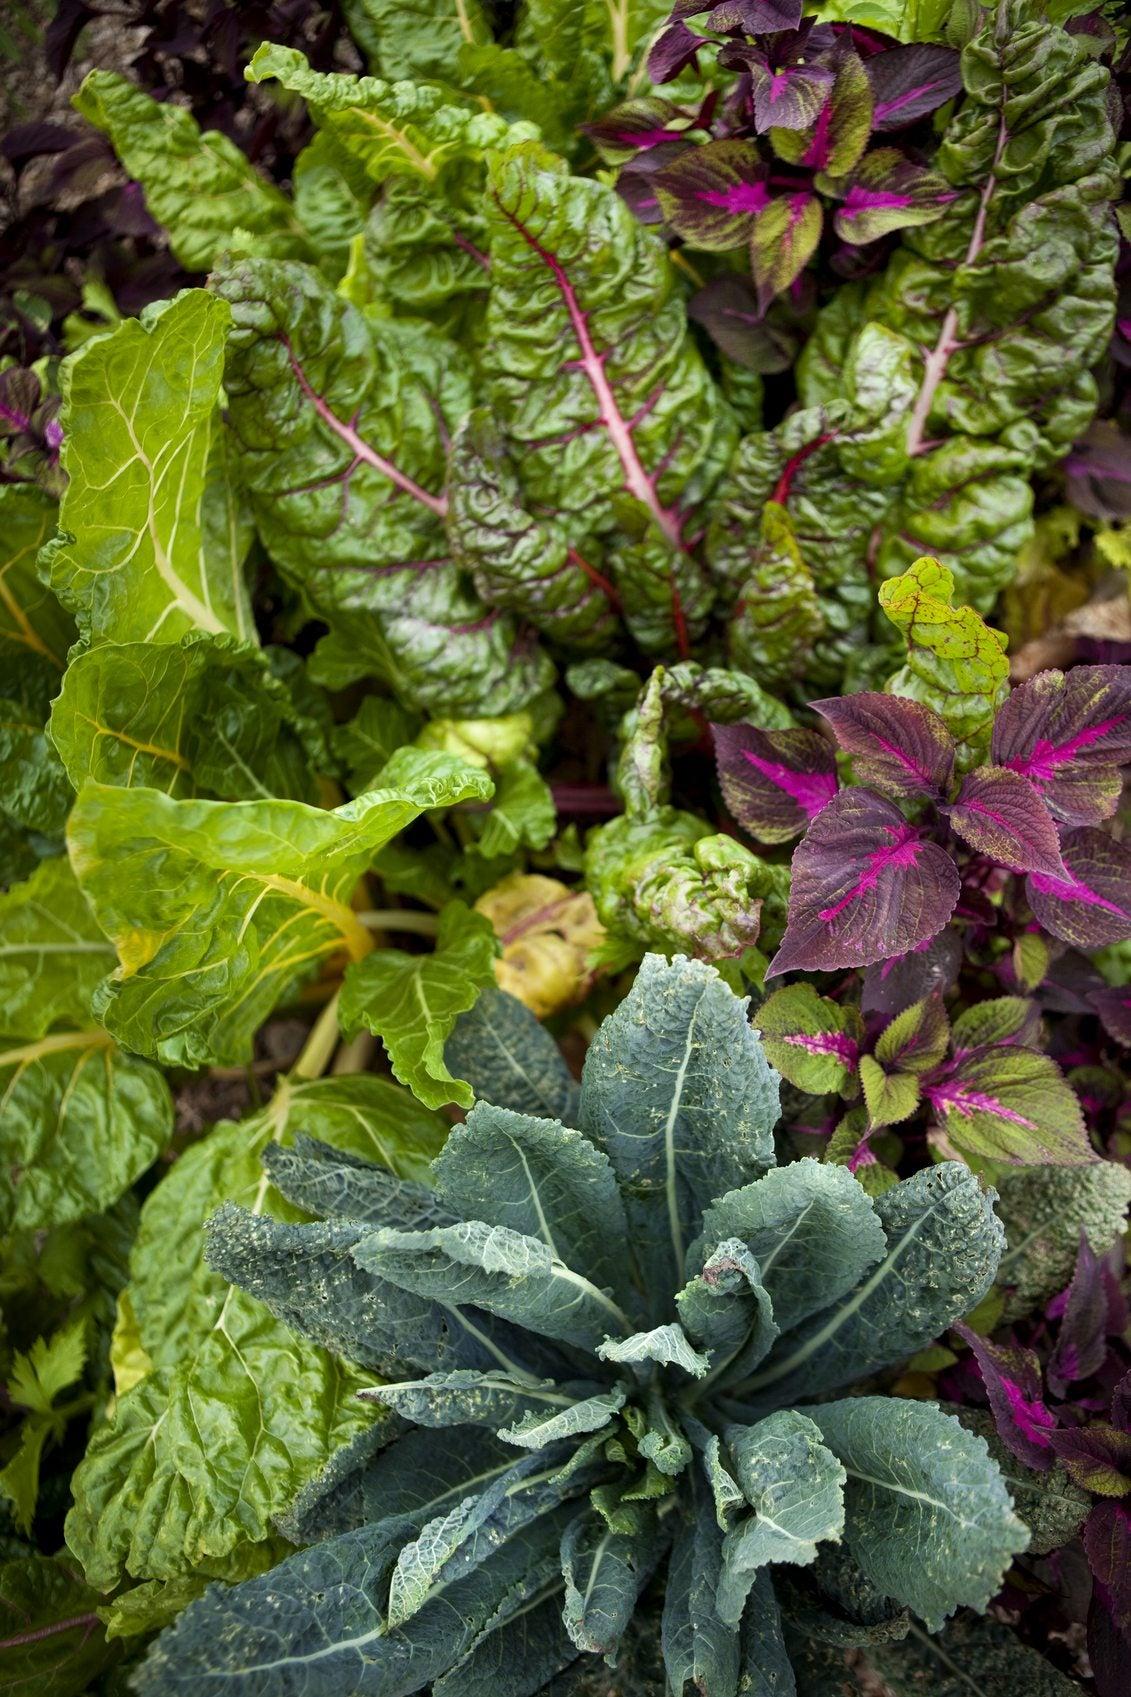 Chard Companion Plants Tips On Companion Planting With Chard